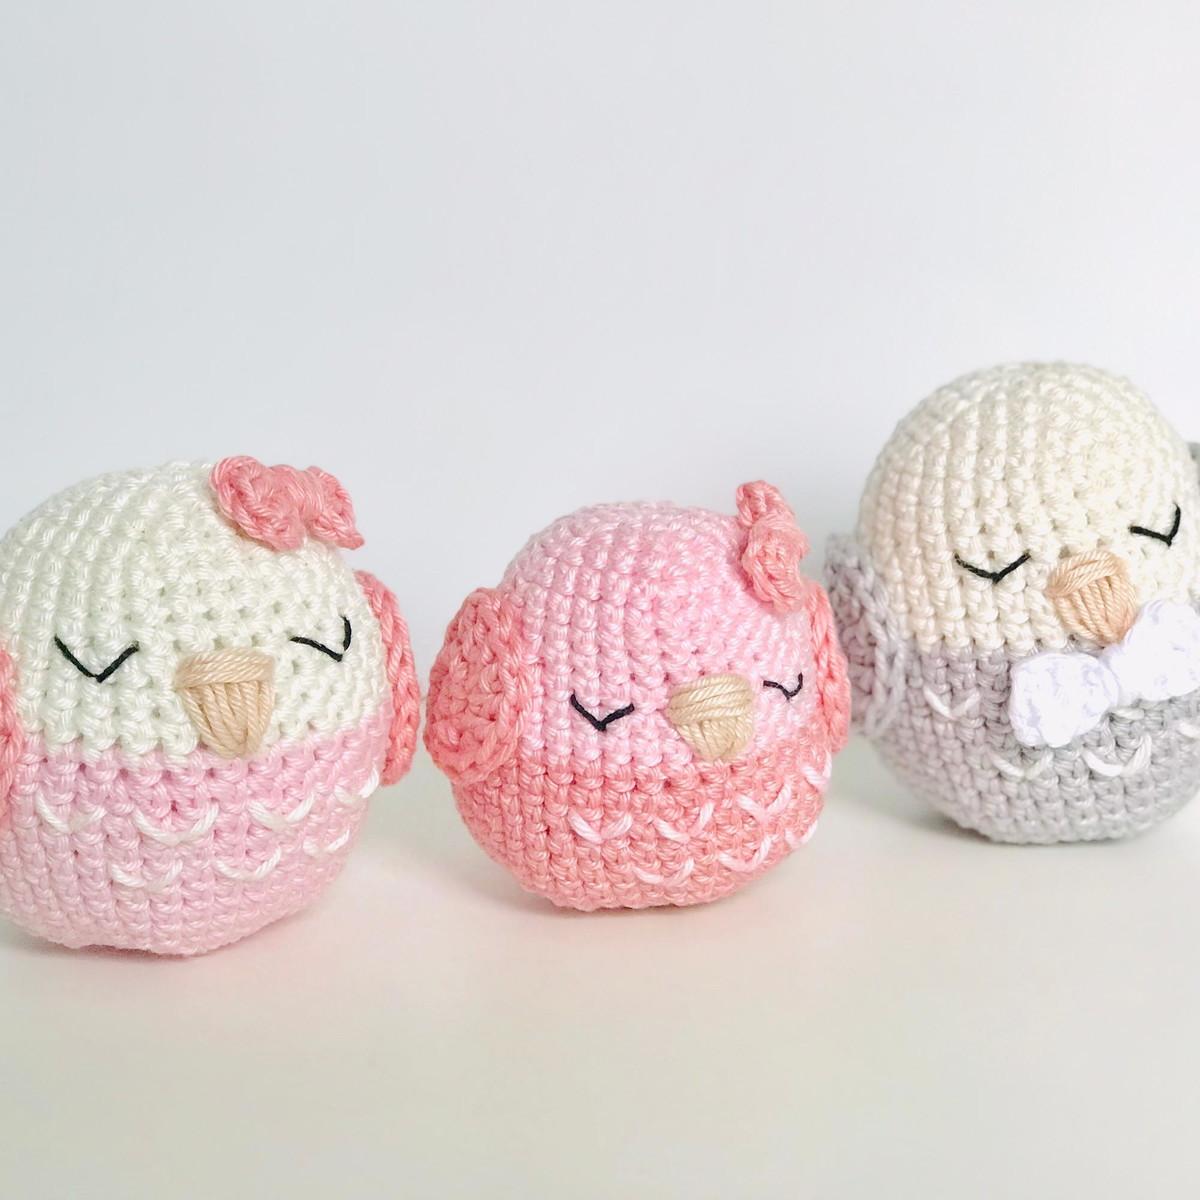 PEPPA PIG Amigurumi Pattern, Peppa Pig Patrón Amigurumi in 2020 ... | 1200x1200